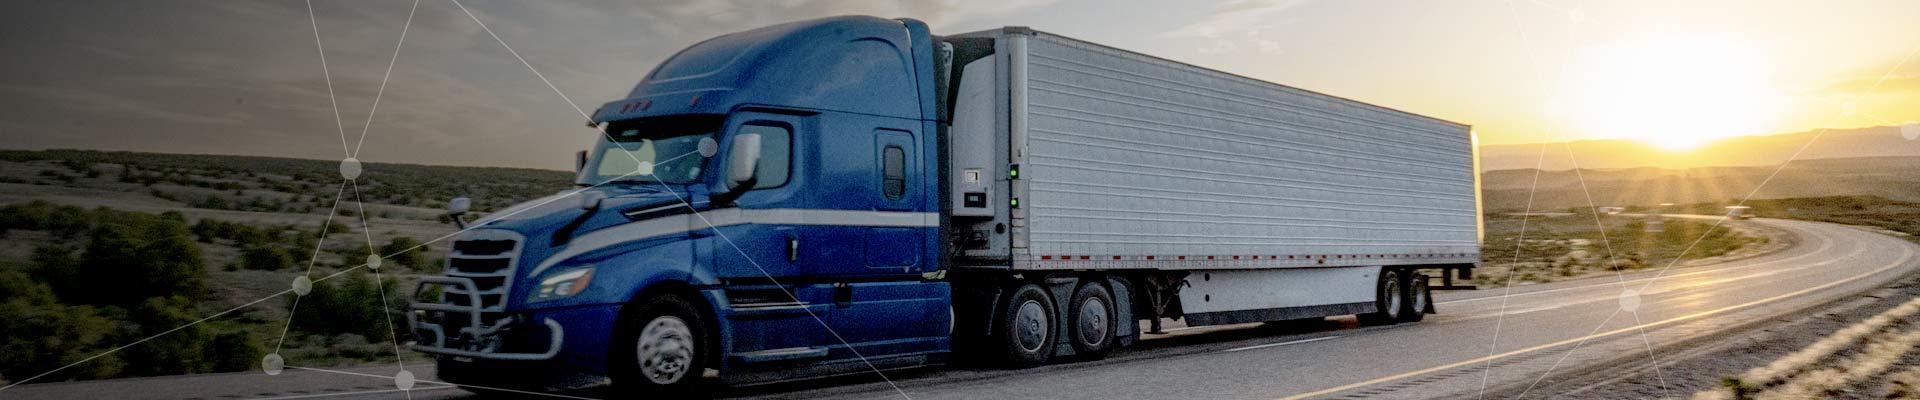 reefer trailer tracking solution